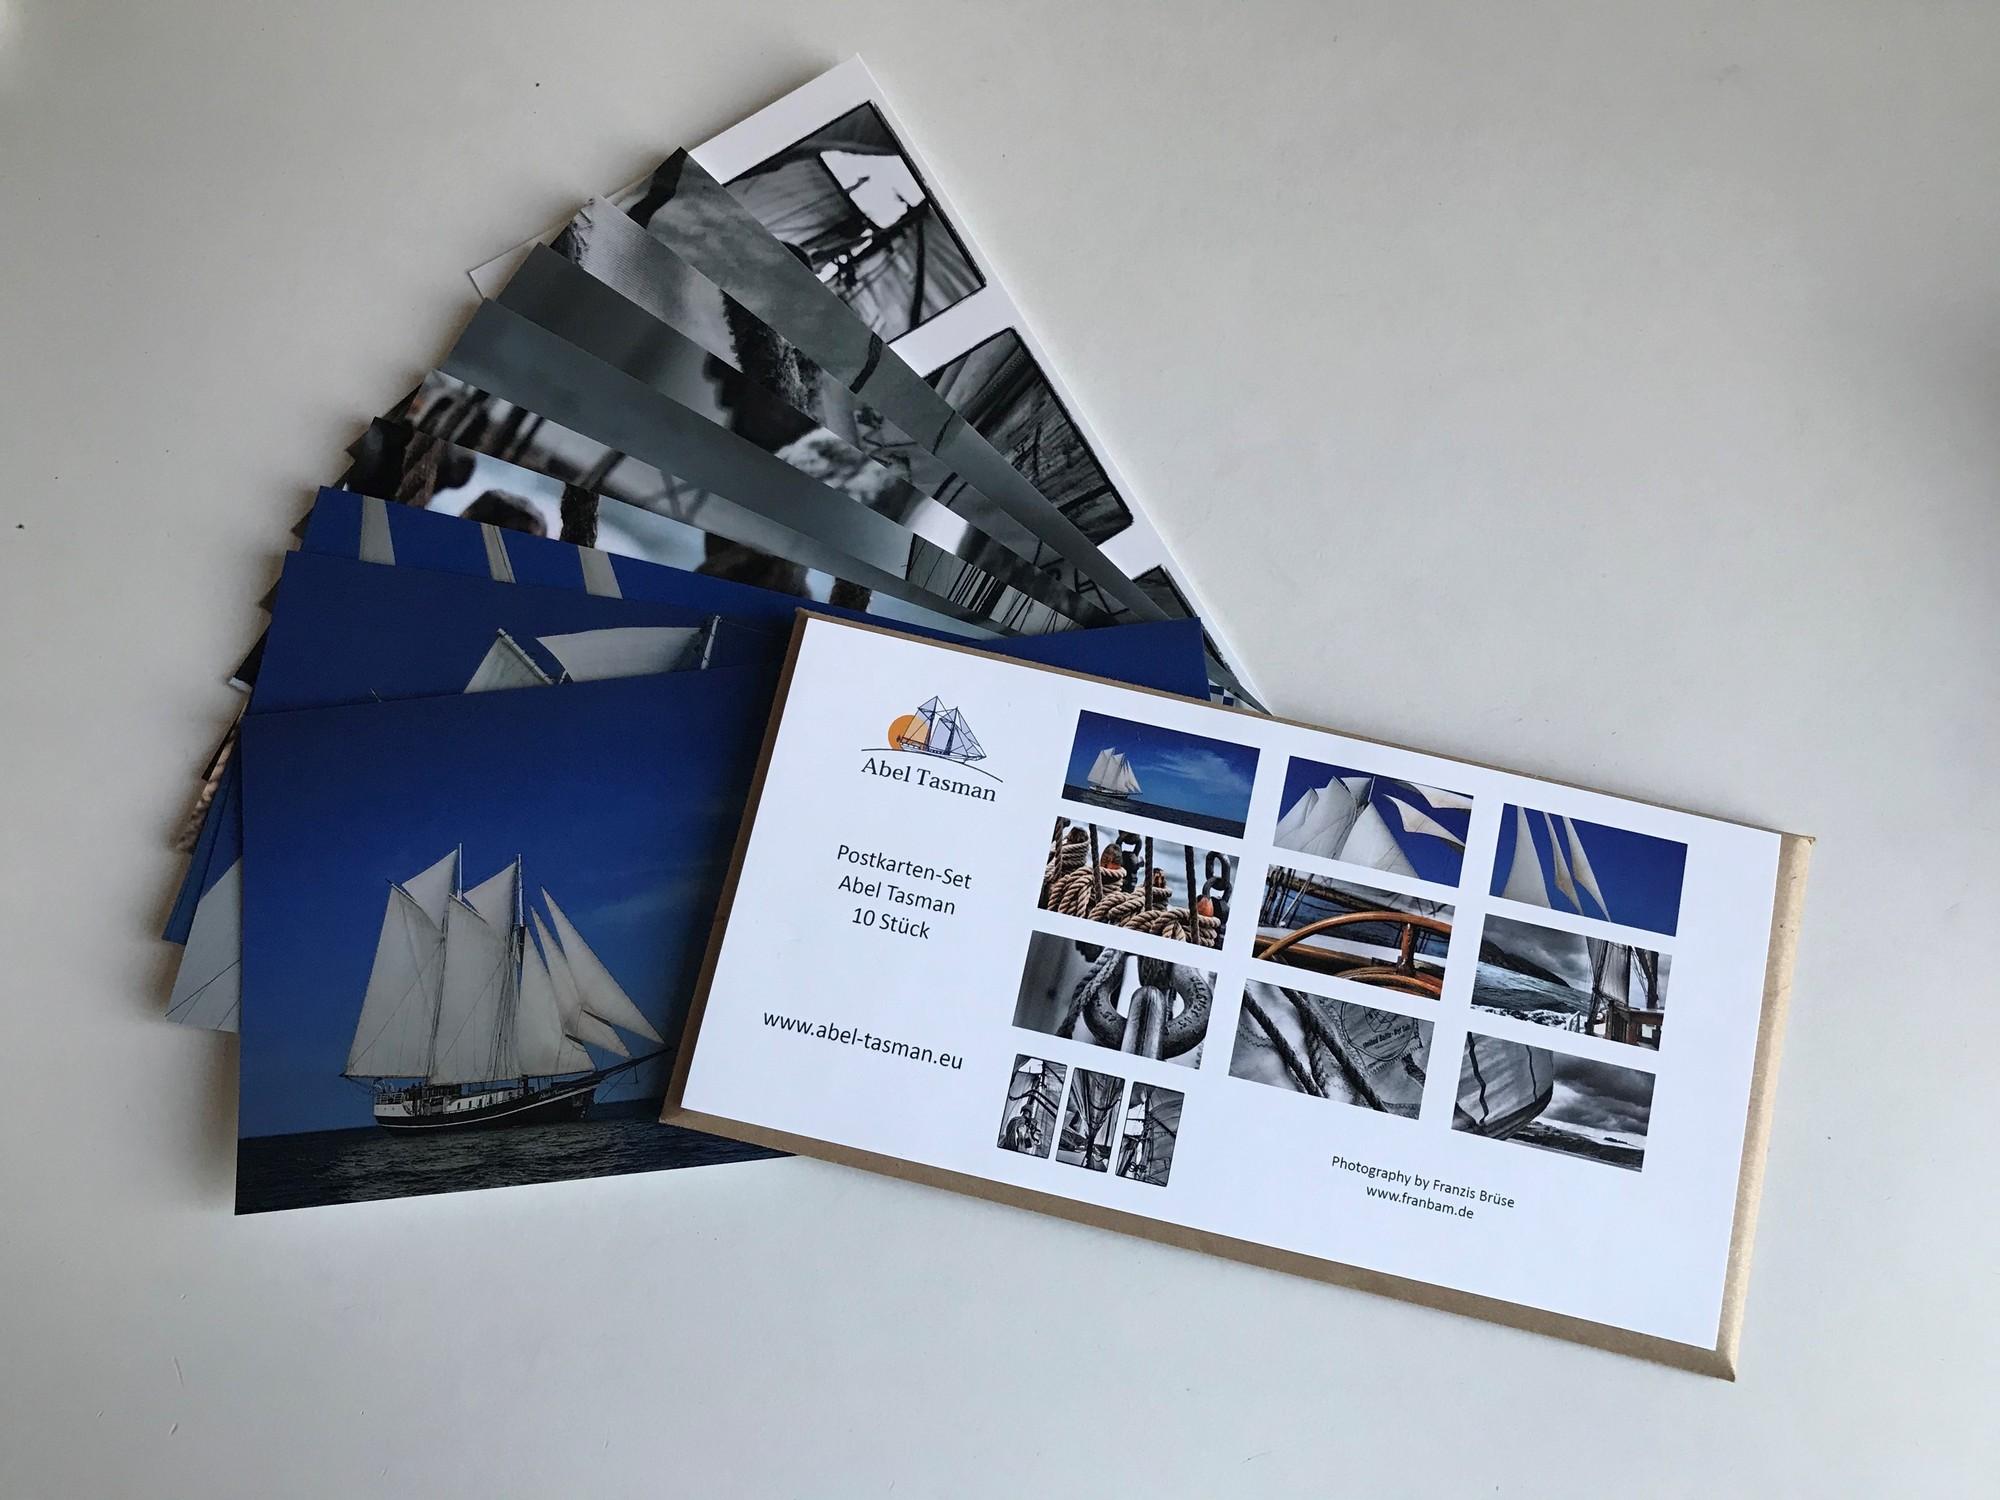 Postkartenset Abel Tasman